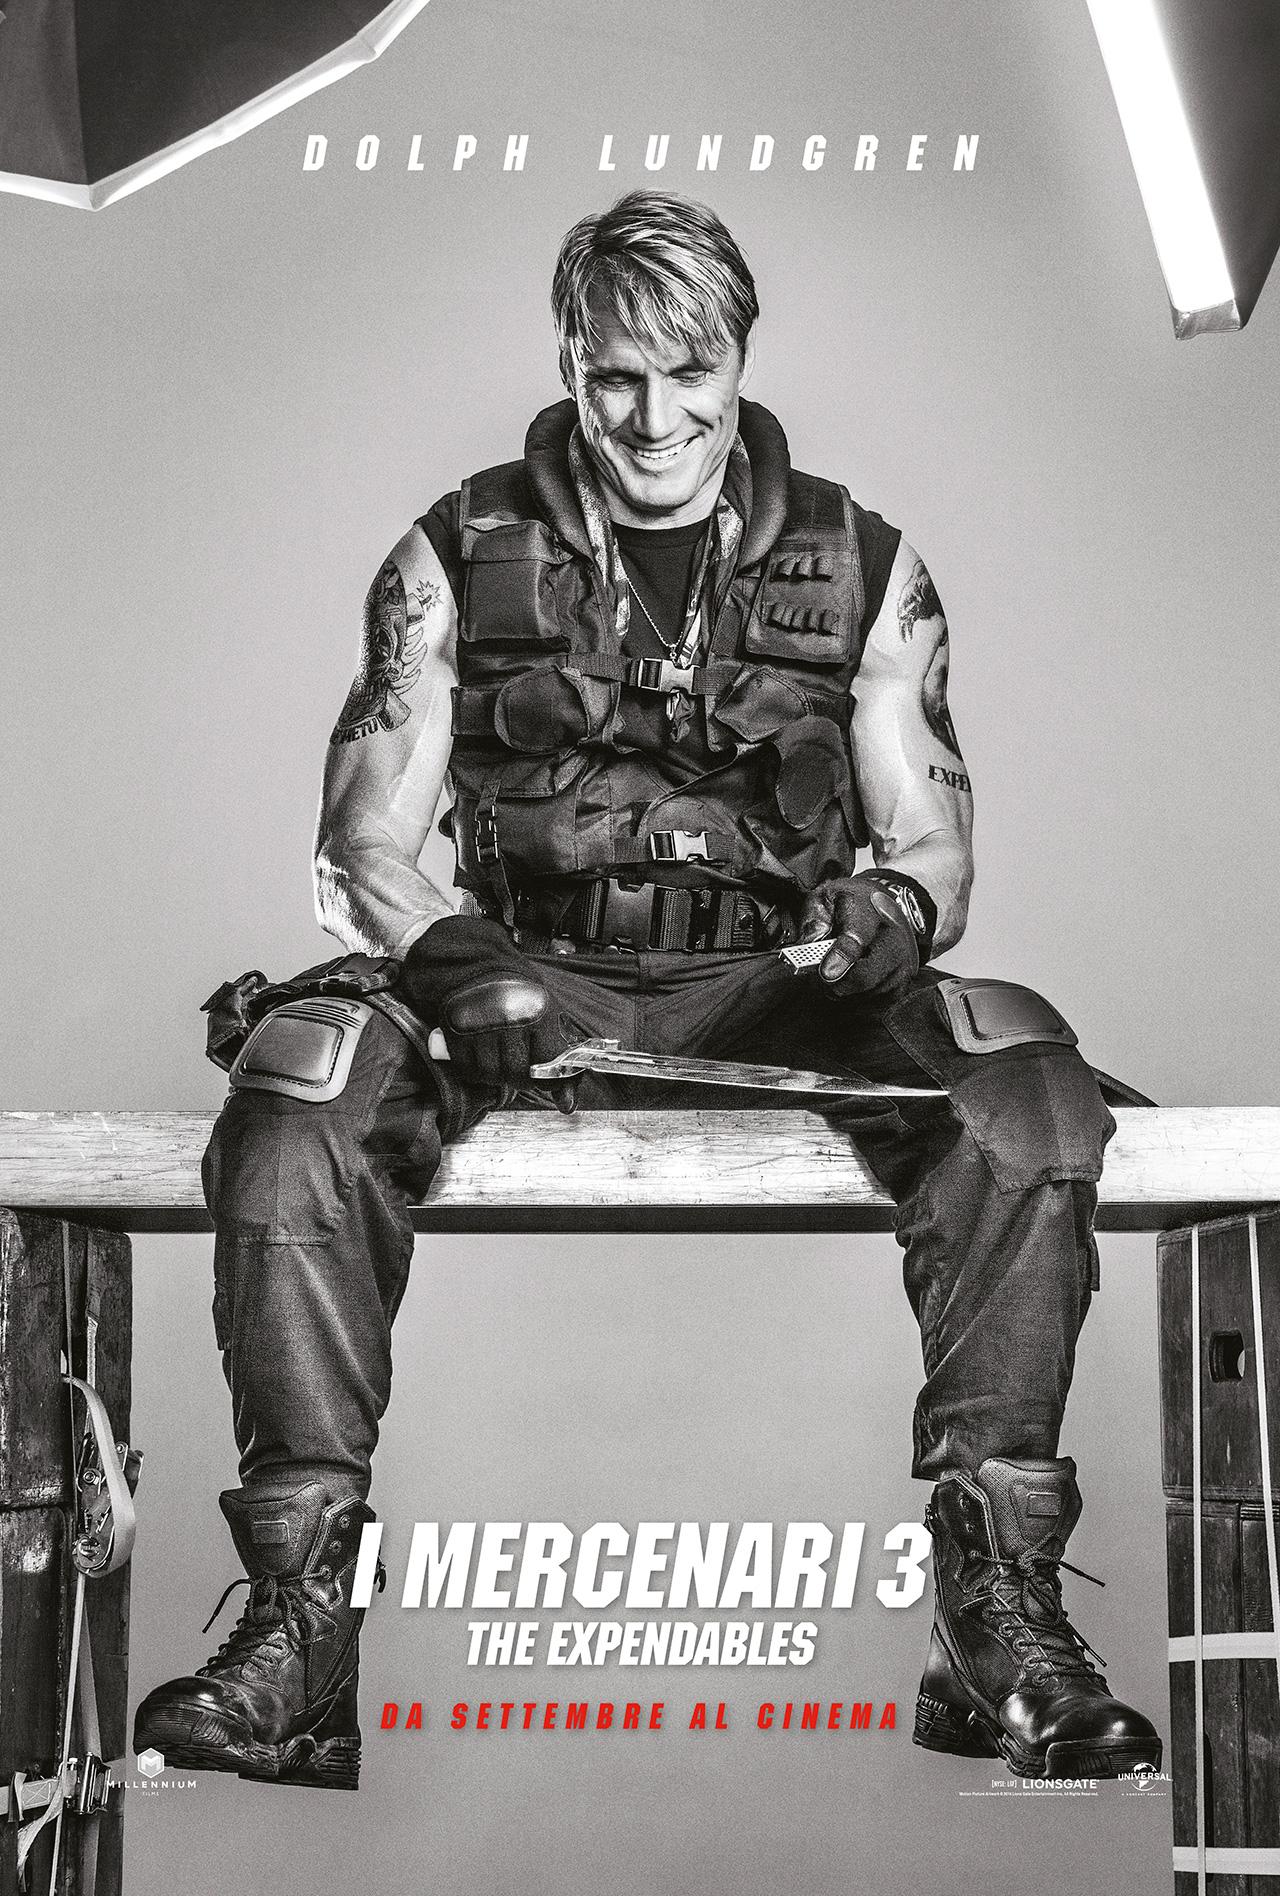 I Mercenari 3 - The Expendables: il character poster di Dolph Lundgren